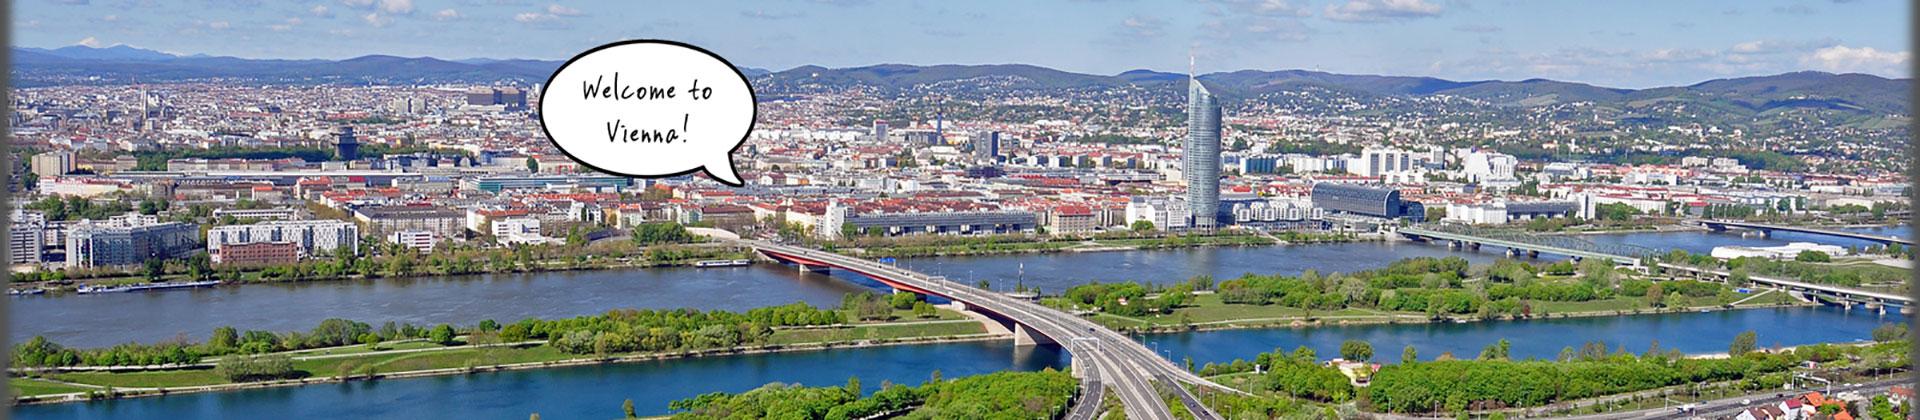 Wien Panorama ds